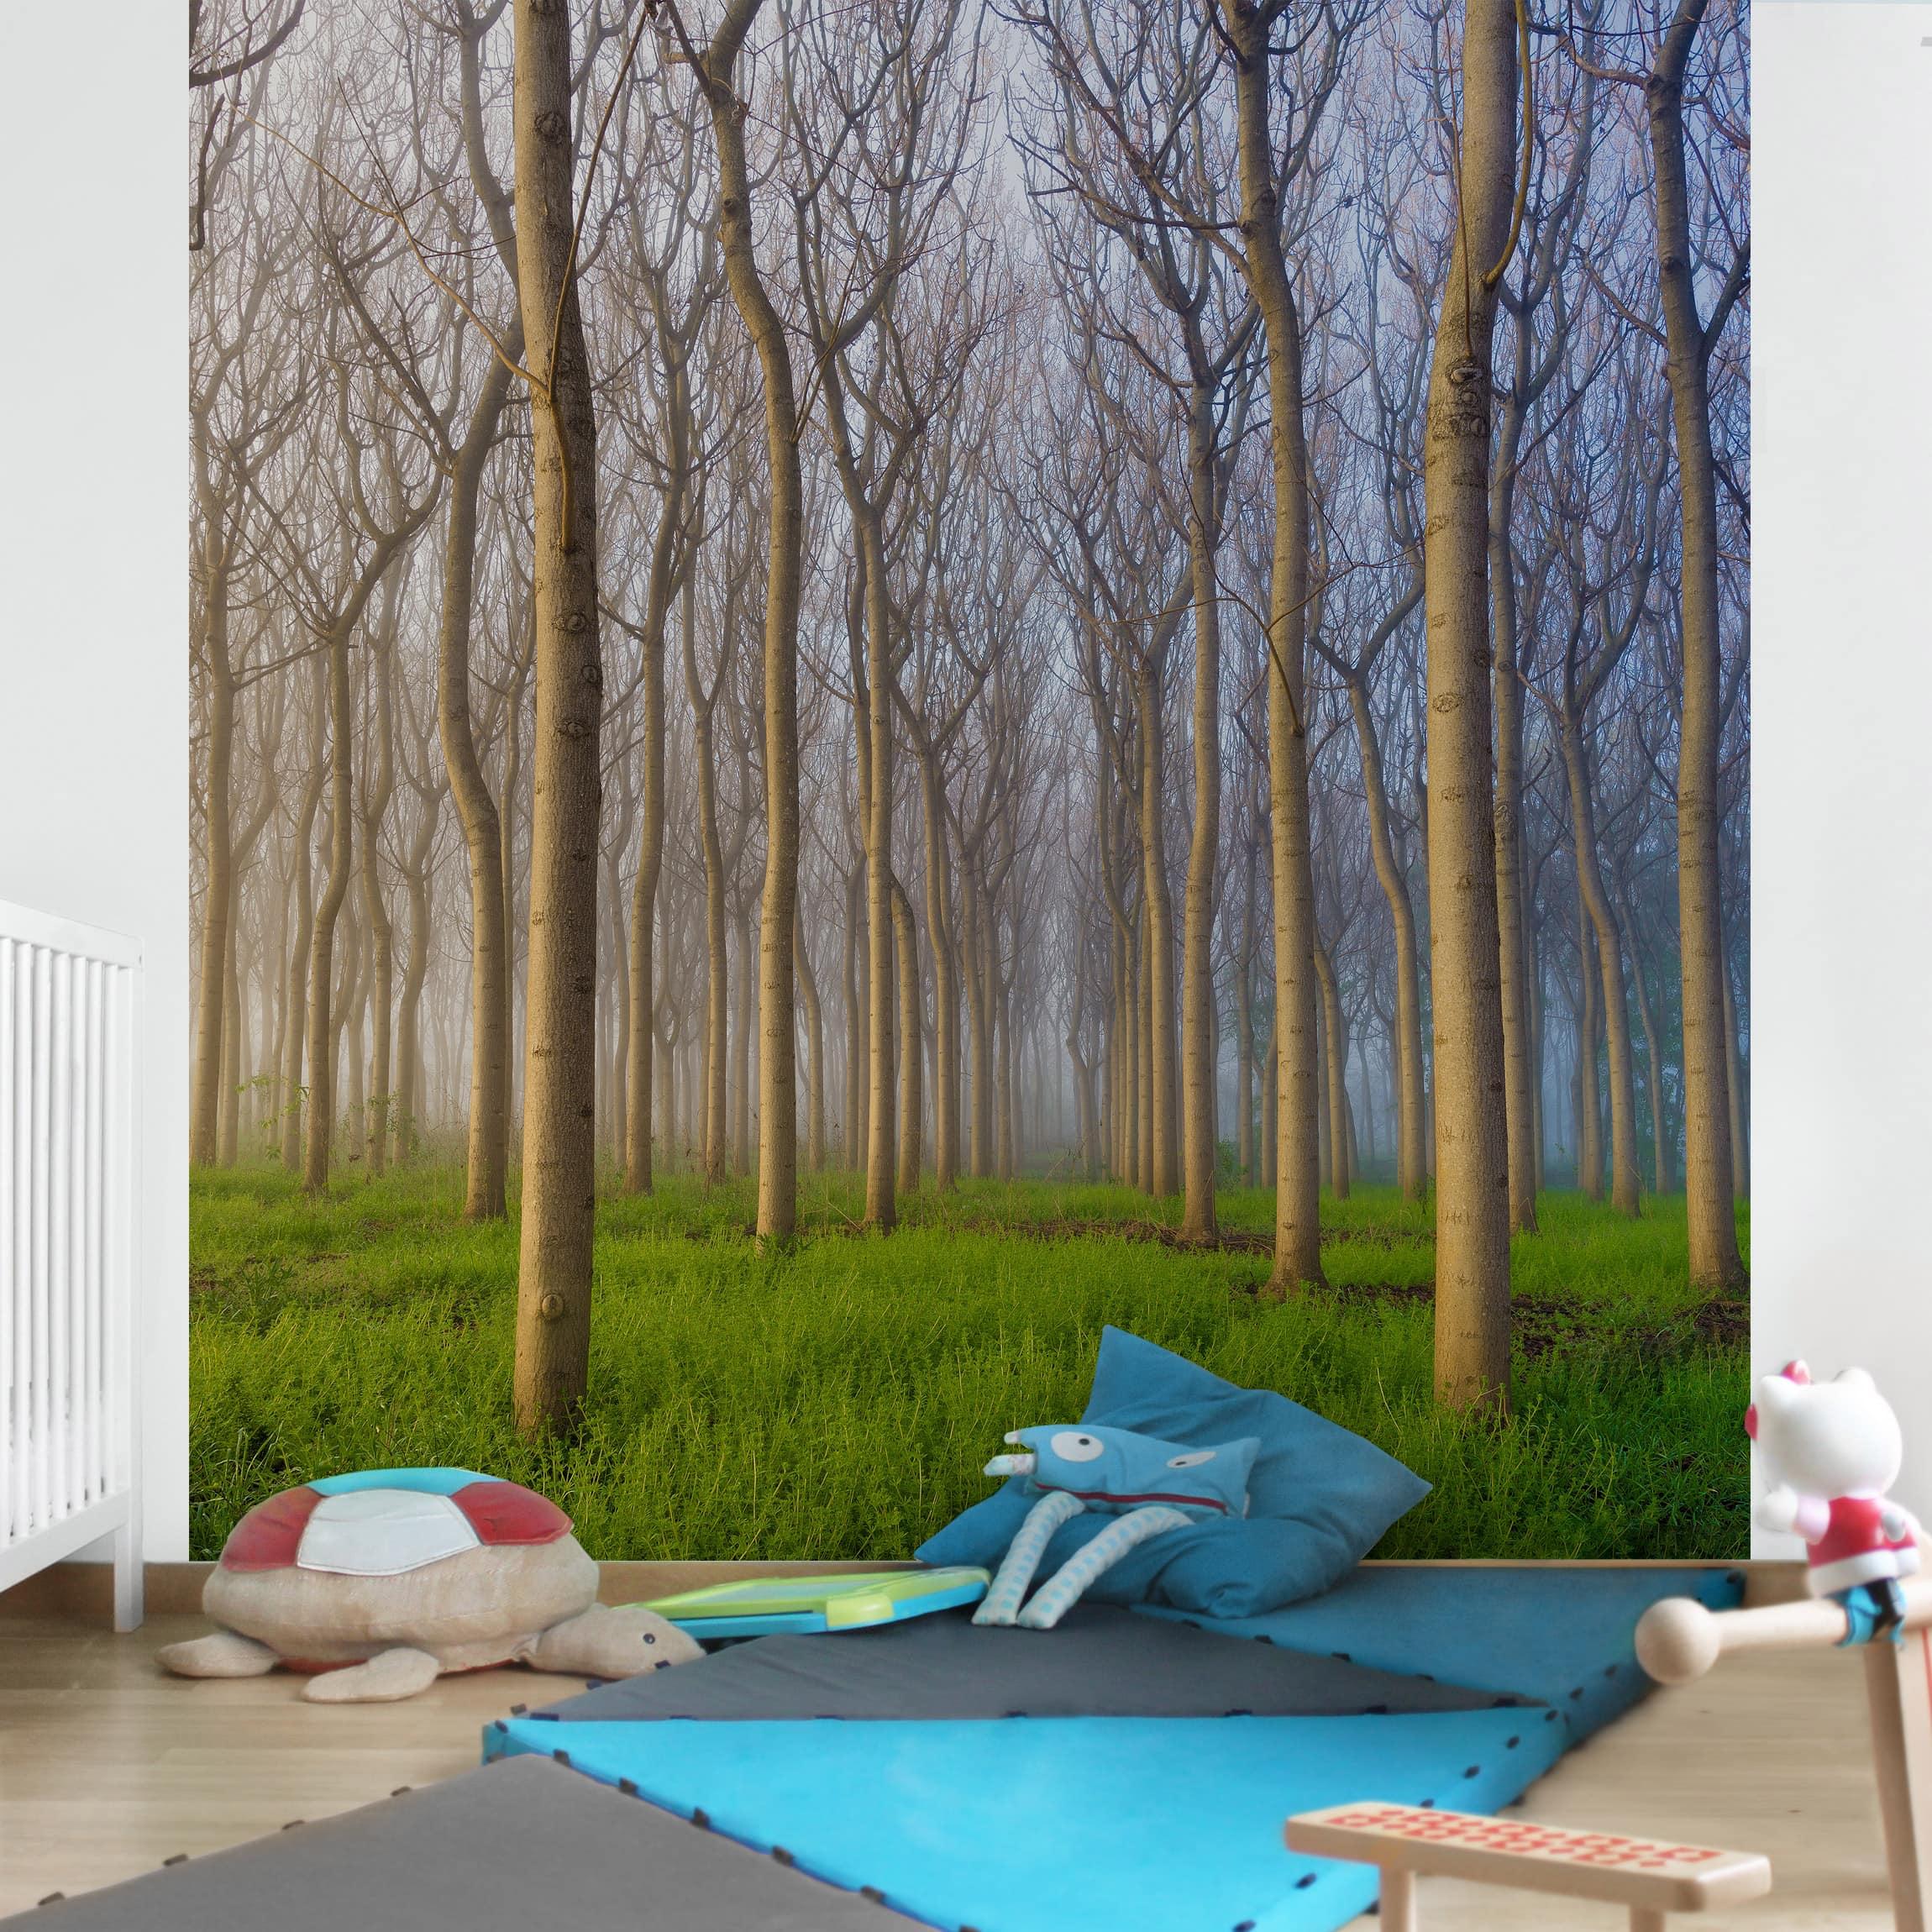 tapete selbstklebend morgen im wald wandbild quadratisch. Black Bedroom Furniture Sets. Home Design Ideas